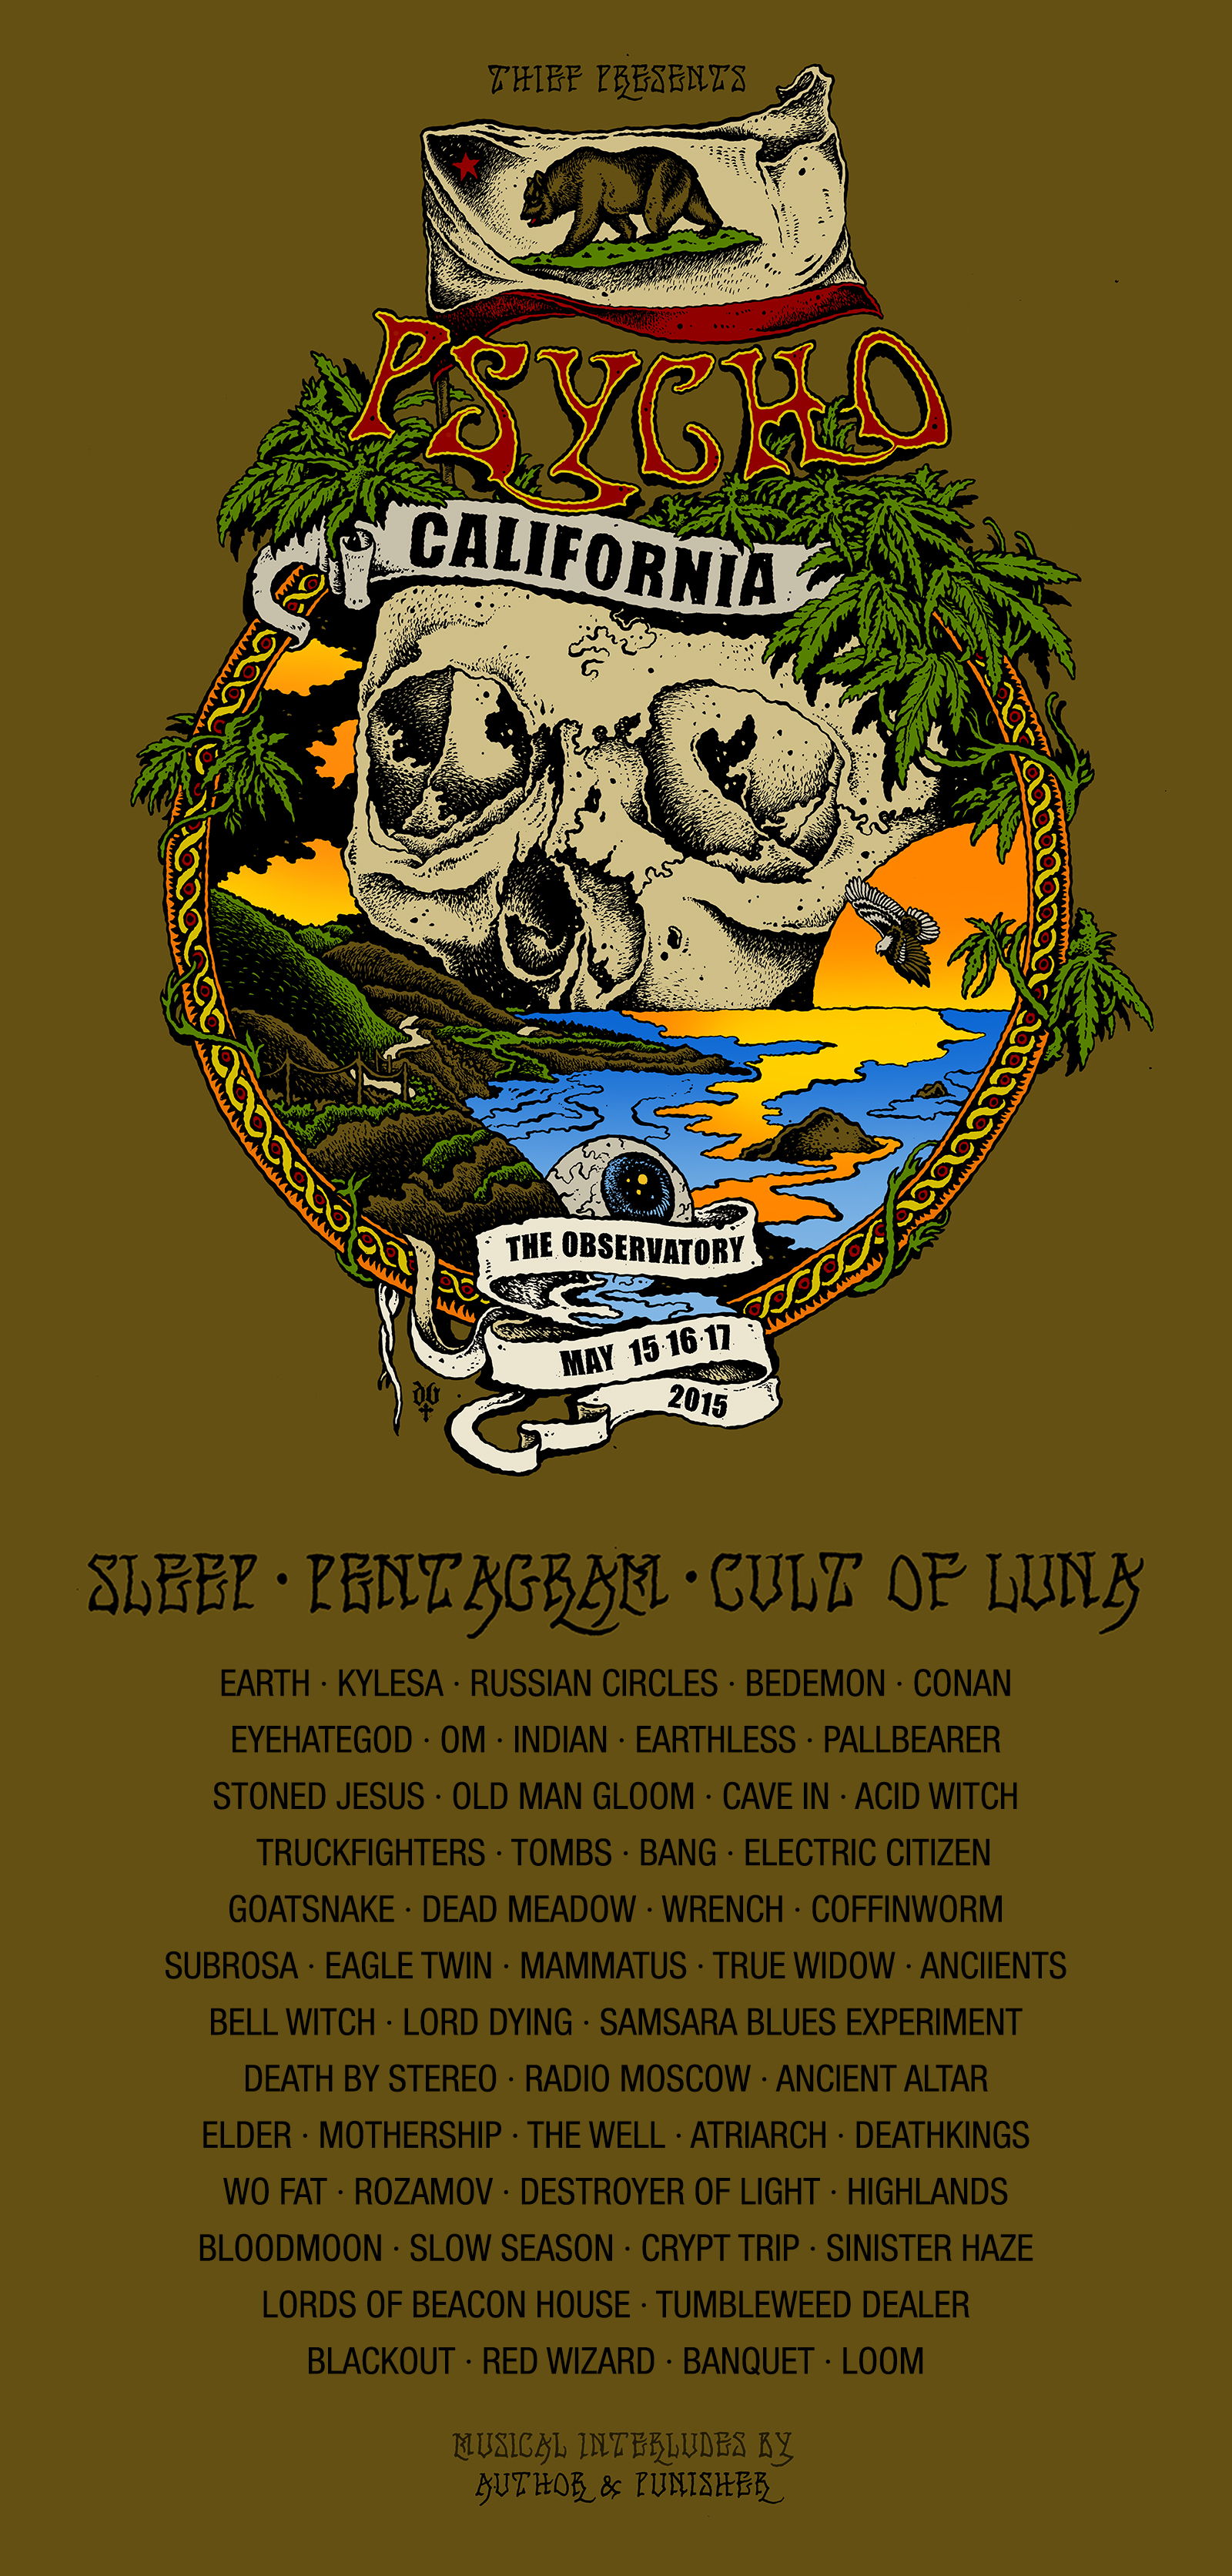 psycho-ca-2015-lineup-poster